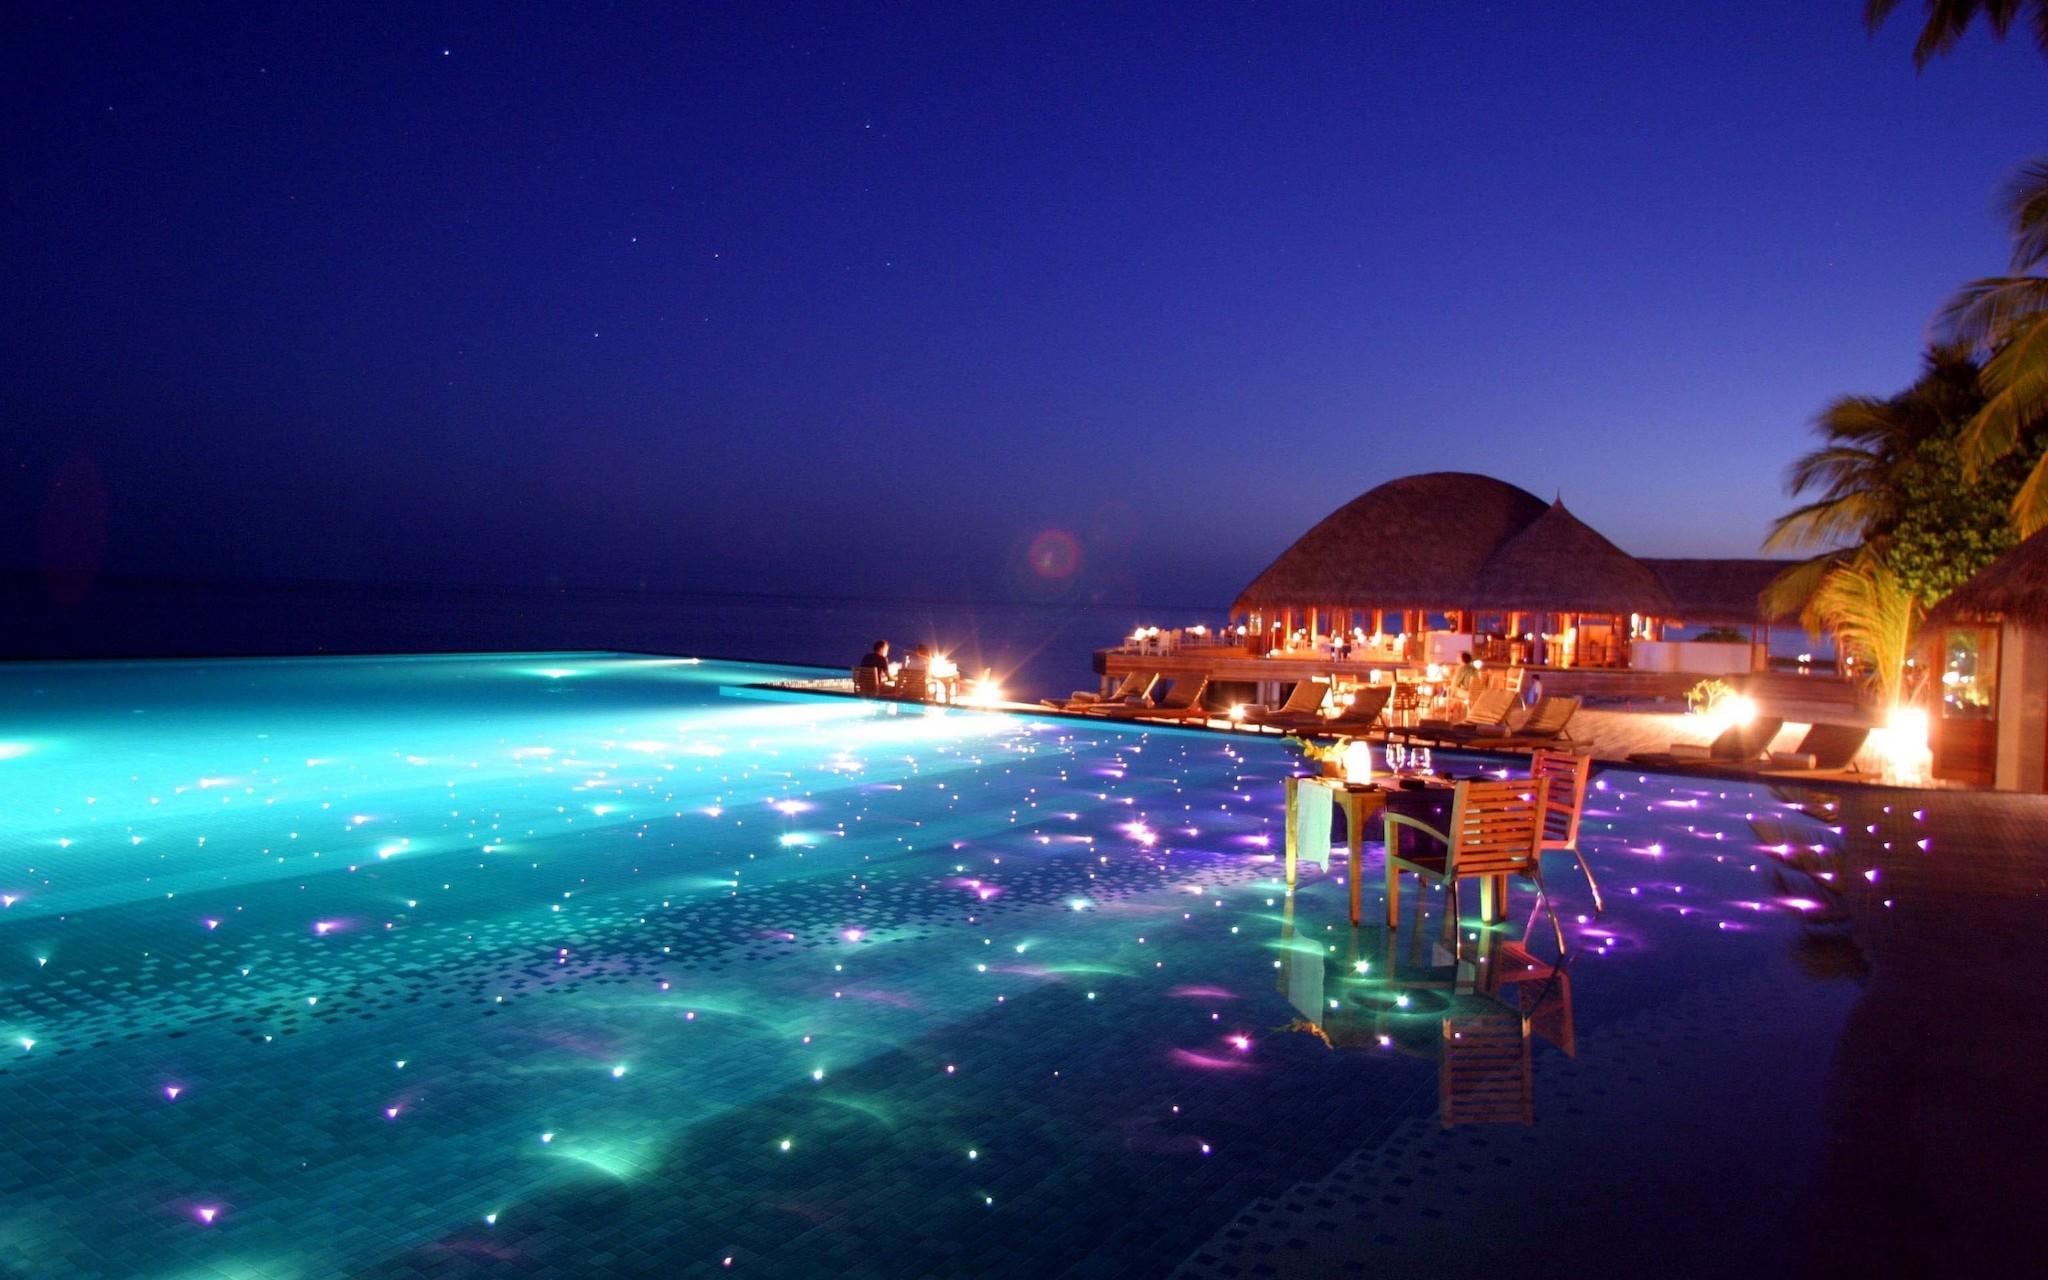 conrad_maldives_1.jpg